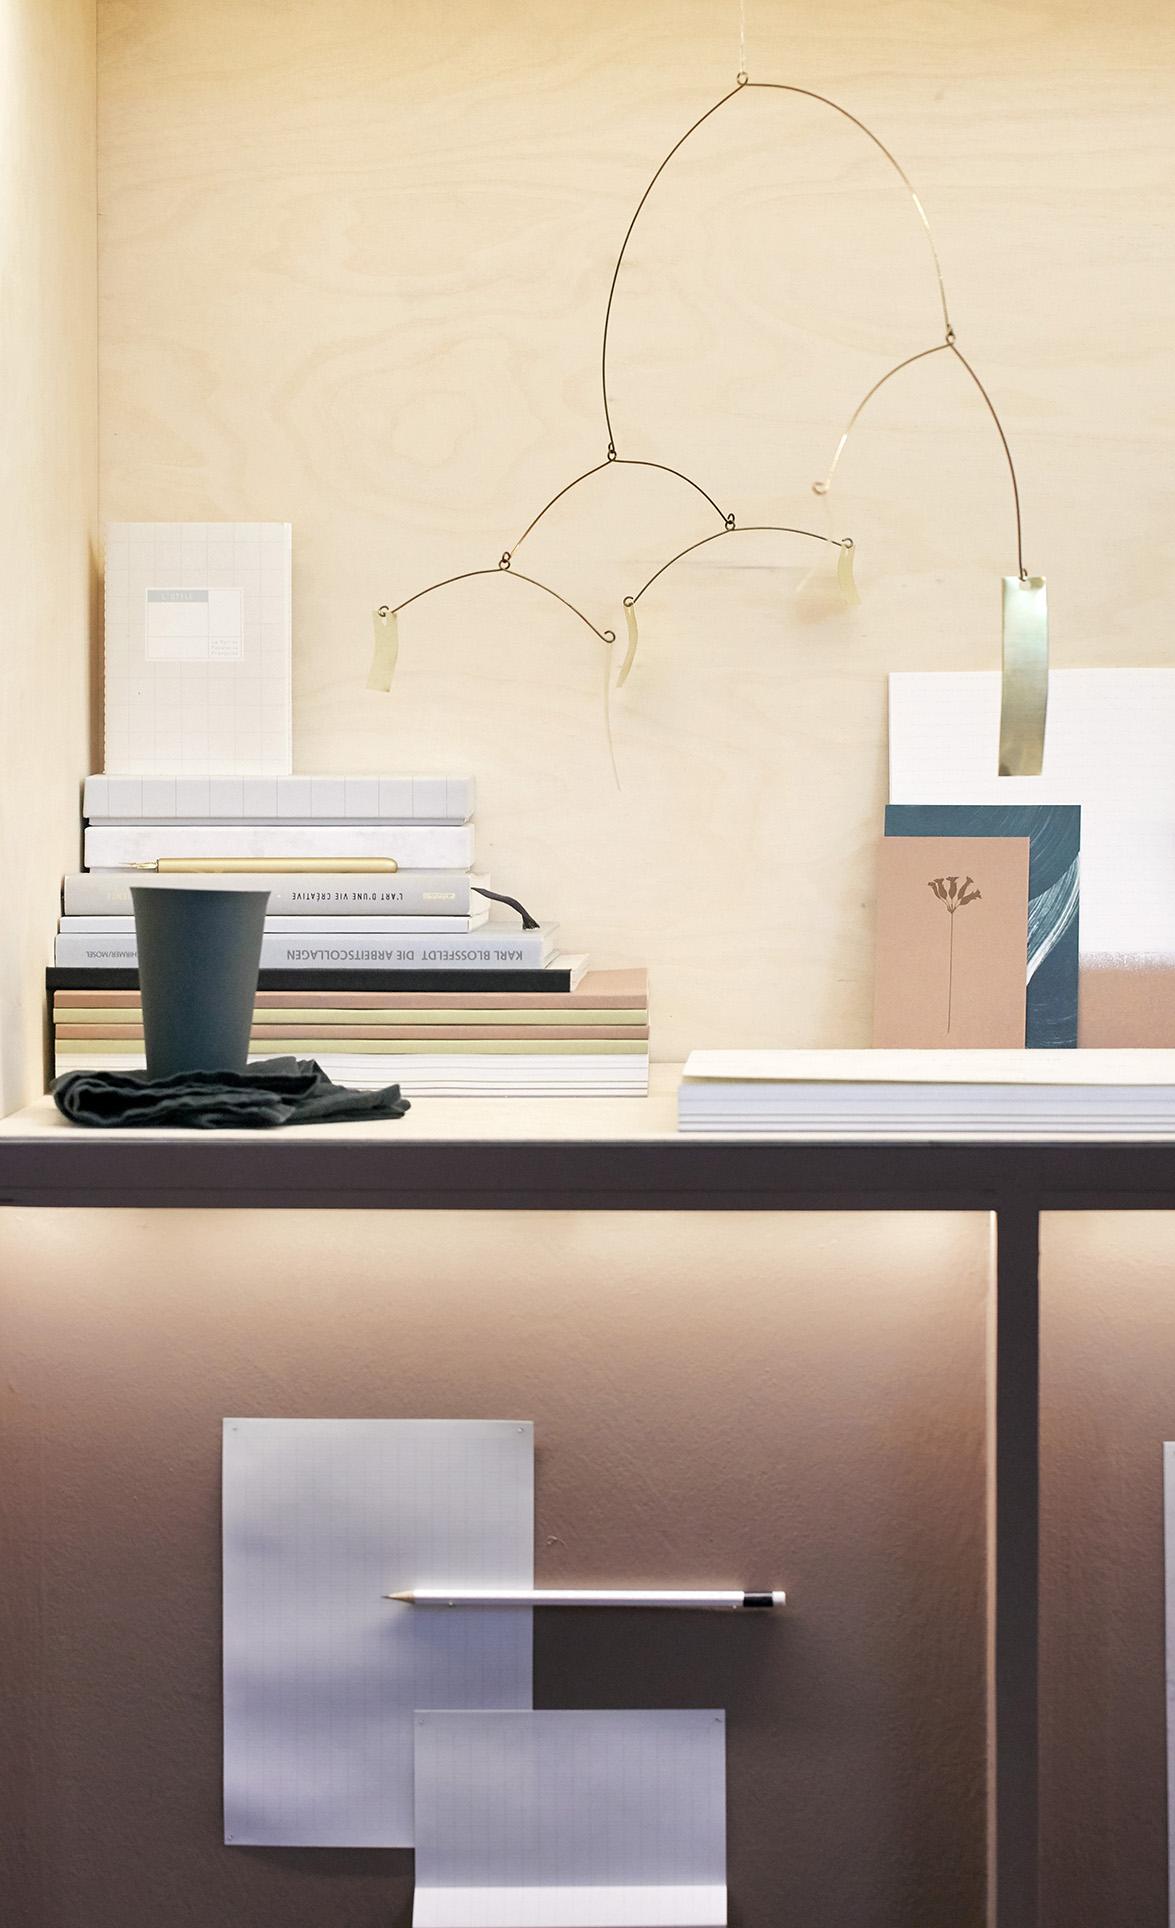 maison objet par s septiembre 2017 presenta el innovador nuevo sector objet. Black Bedroom Furniture Sets. Home Design Ideas